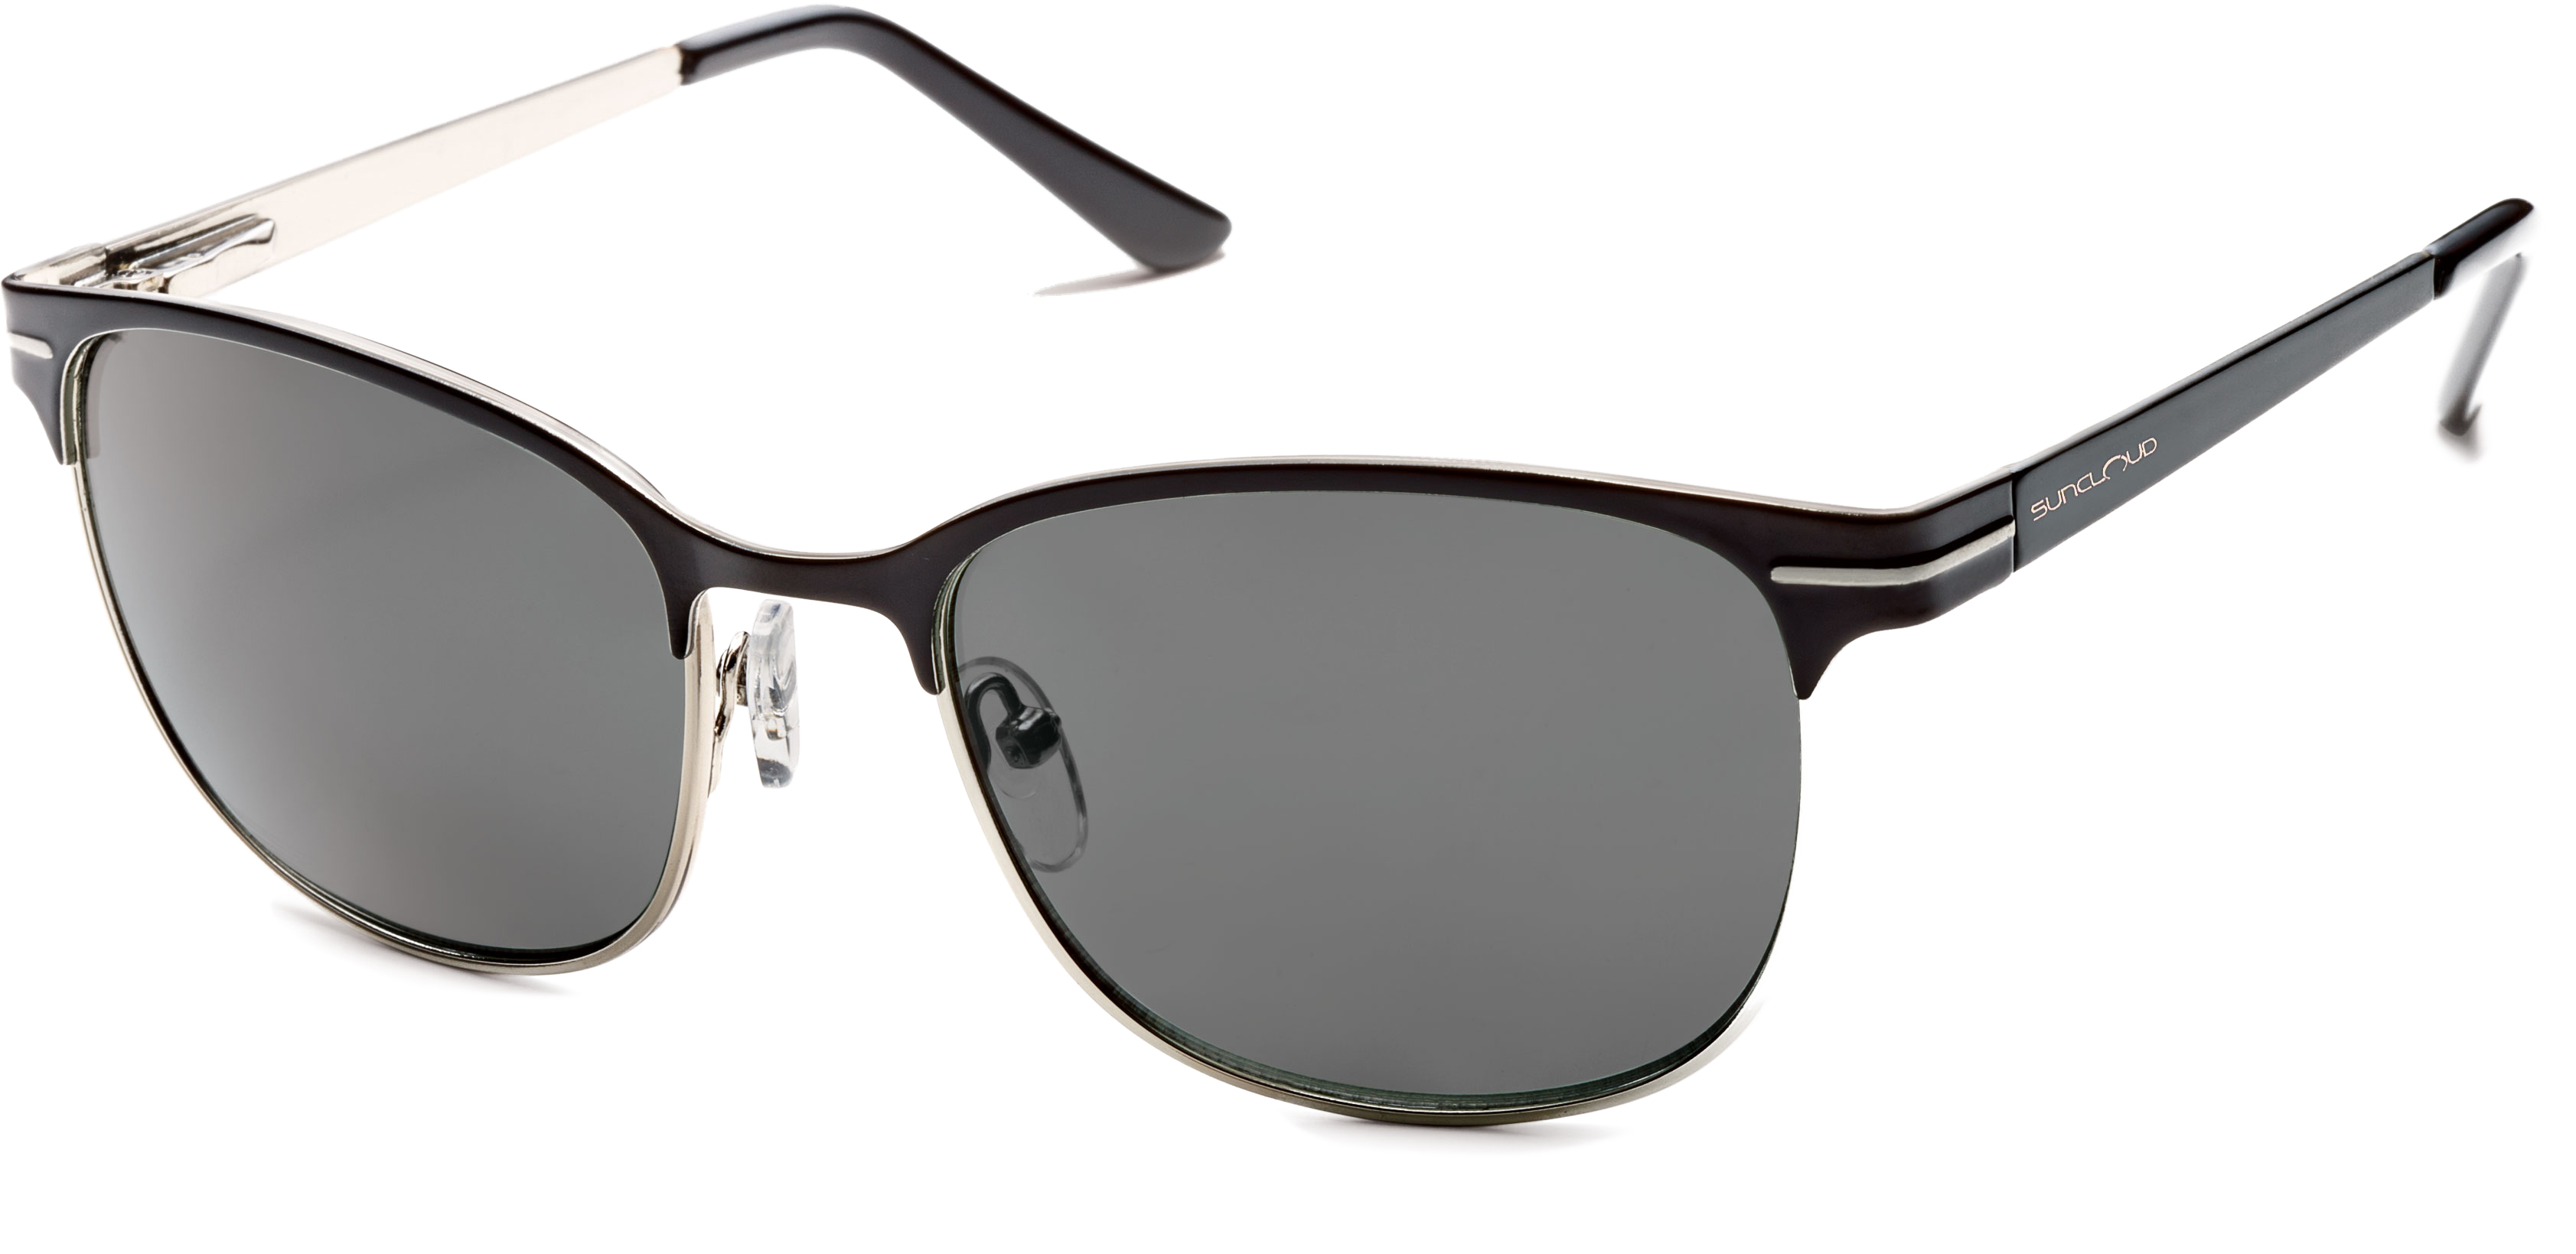 9879533f64 Suncloud Causeway Polarized Sunglasses - Unisex